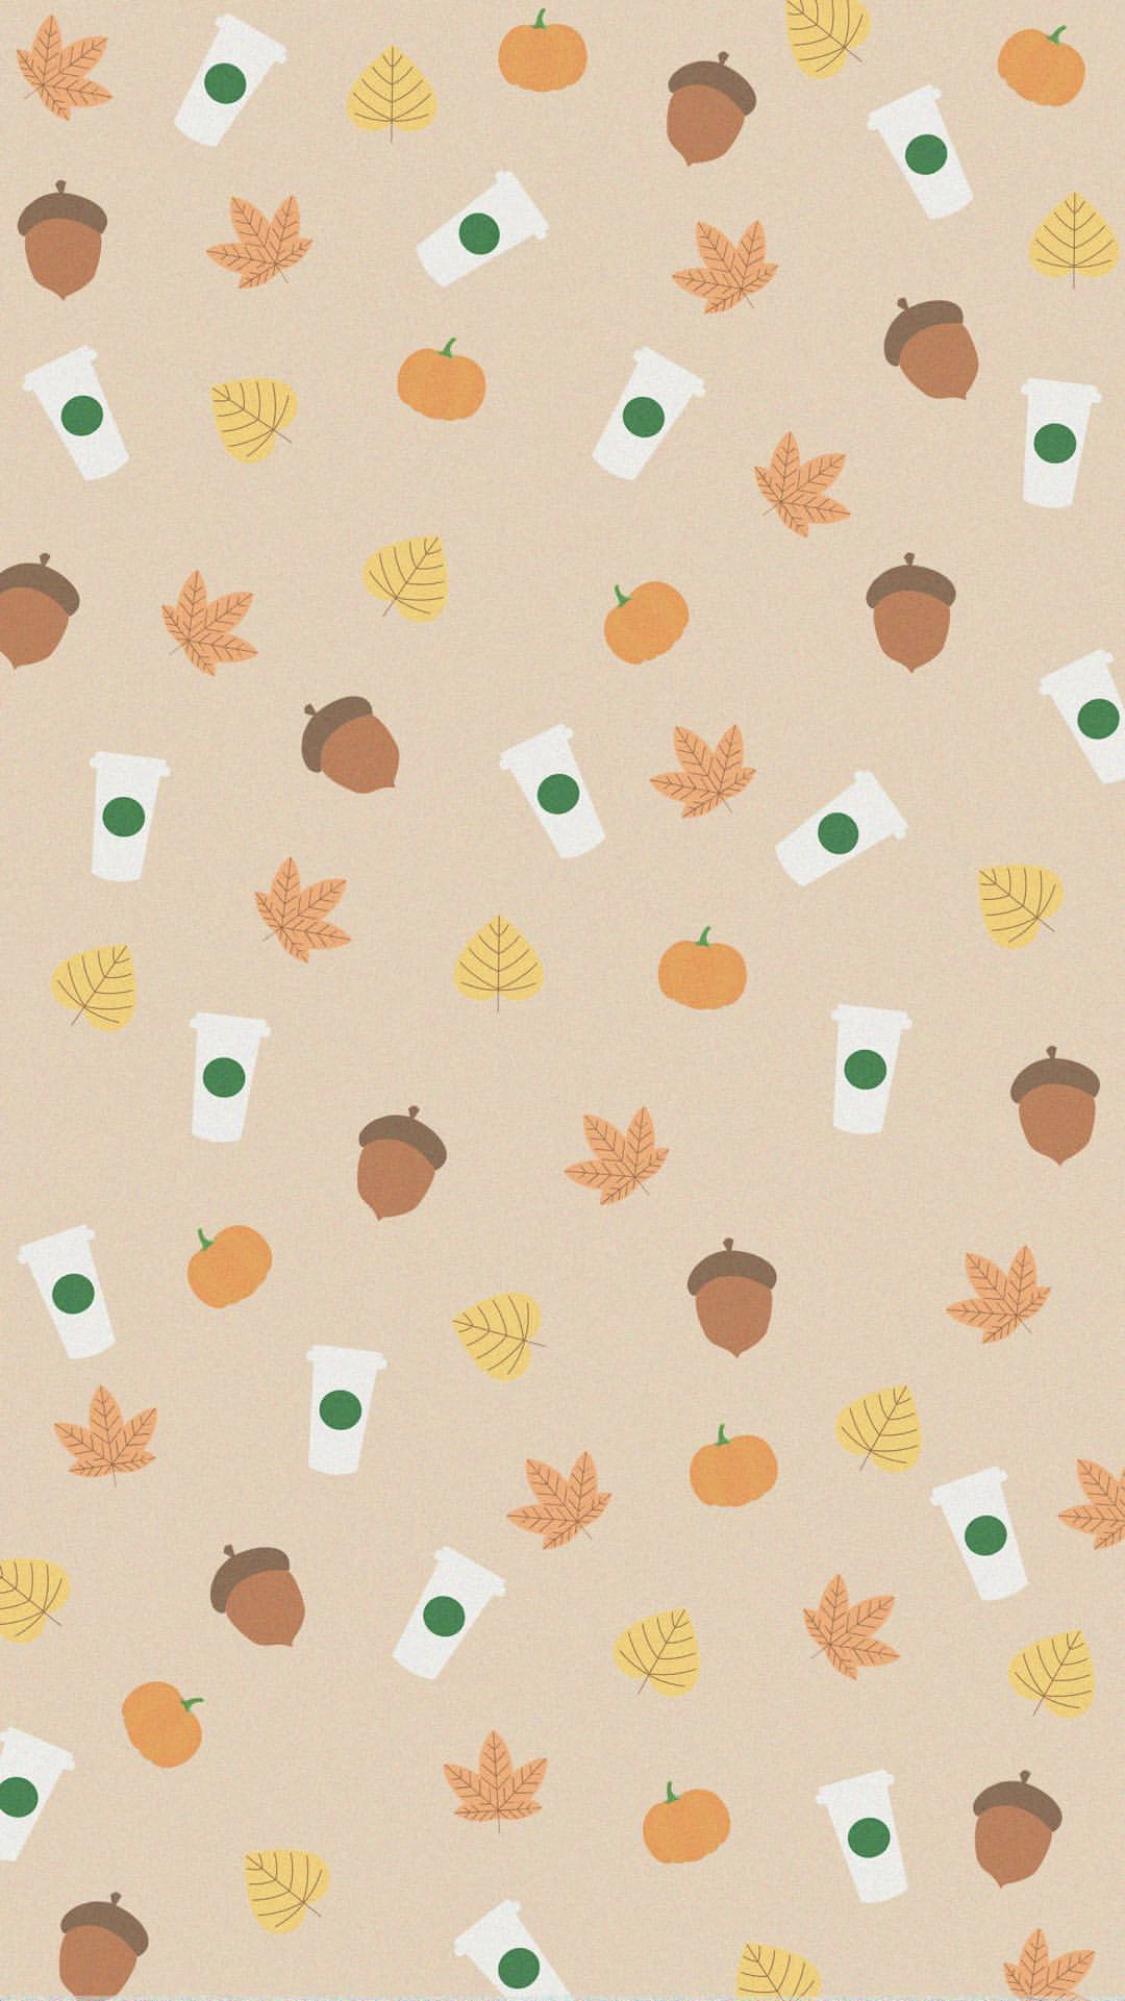 Starbucks Background Fall Autumn Wallpaper Iphone Wallpaper Fall Starbucks Wallpaper Fall Wallpaper